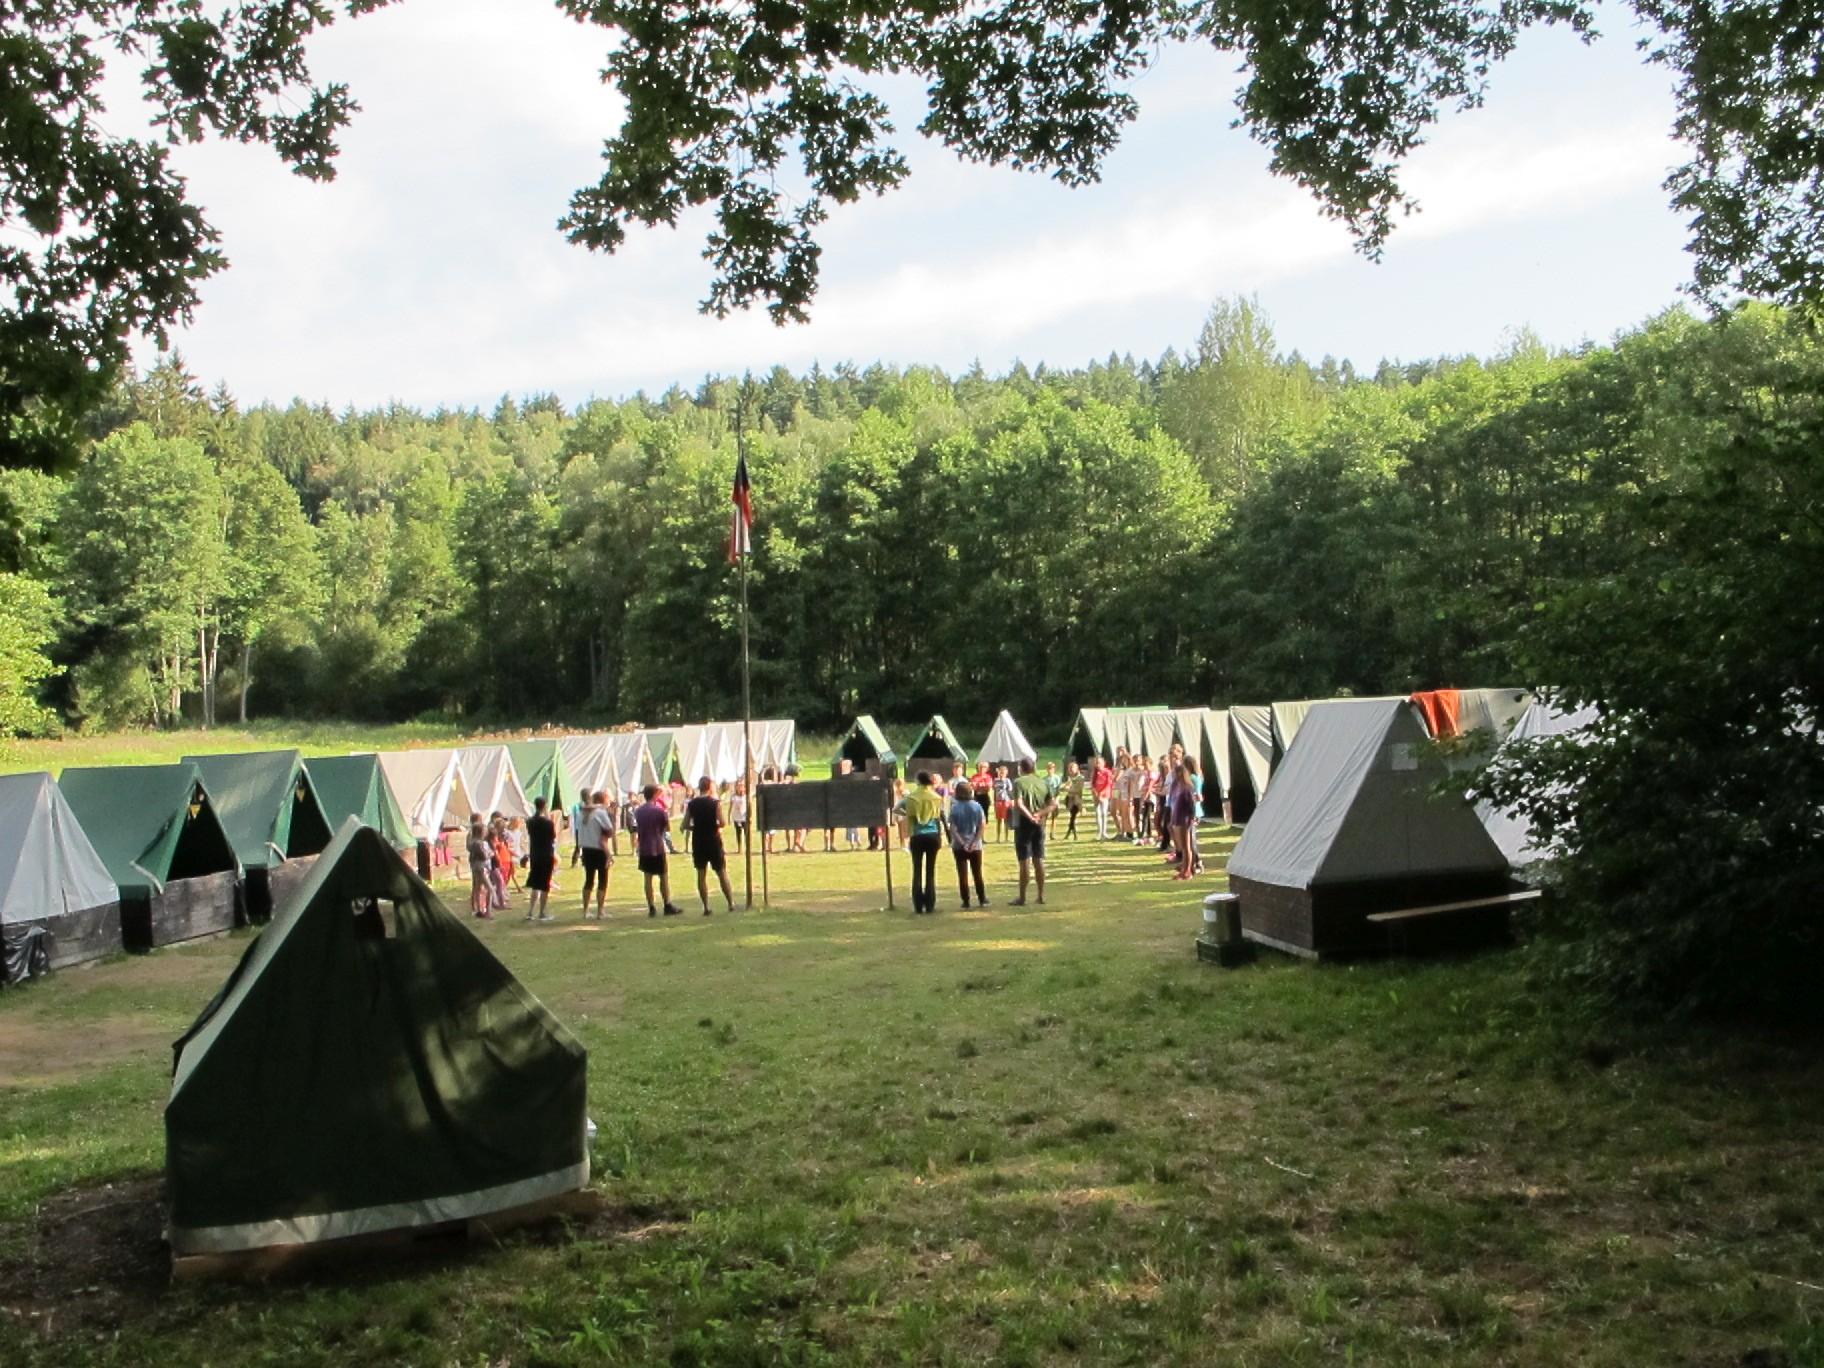 Letní tábor Kočvarův mlýn 2020